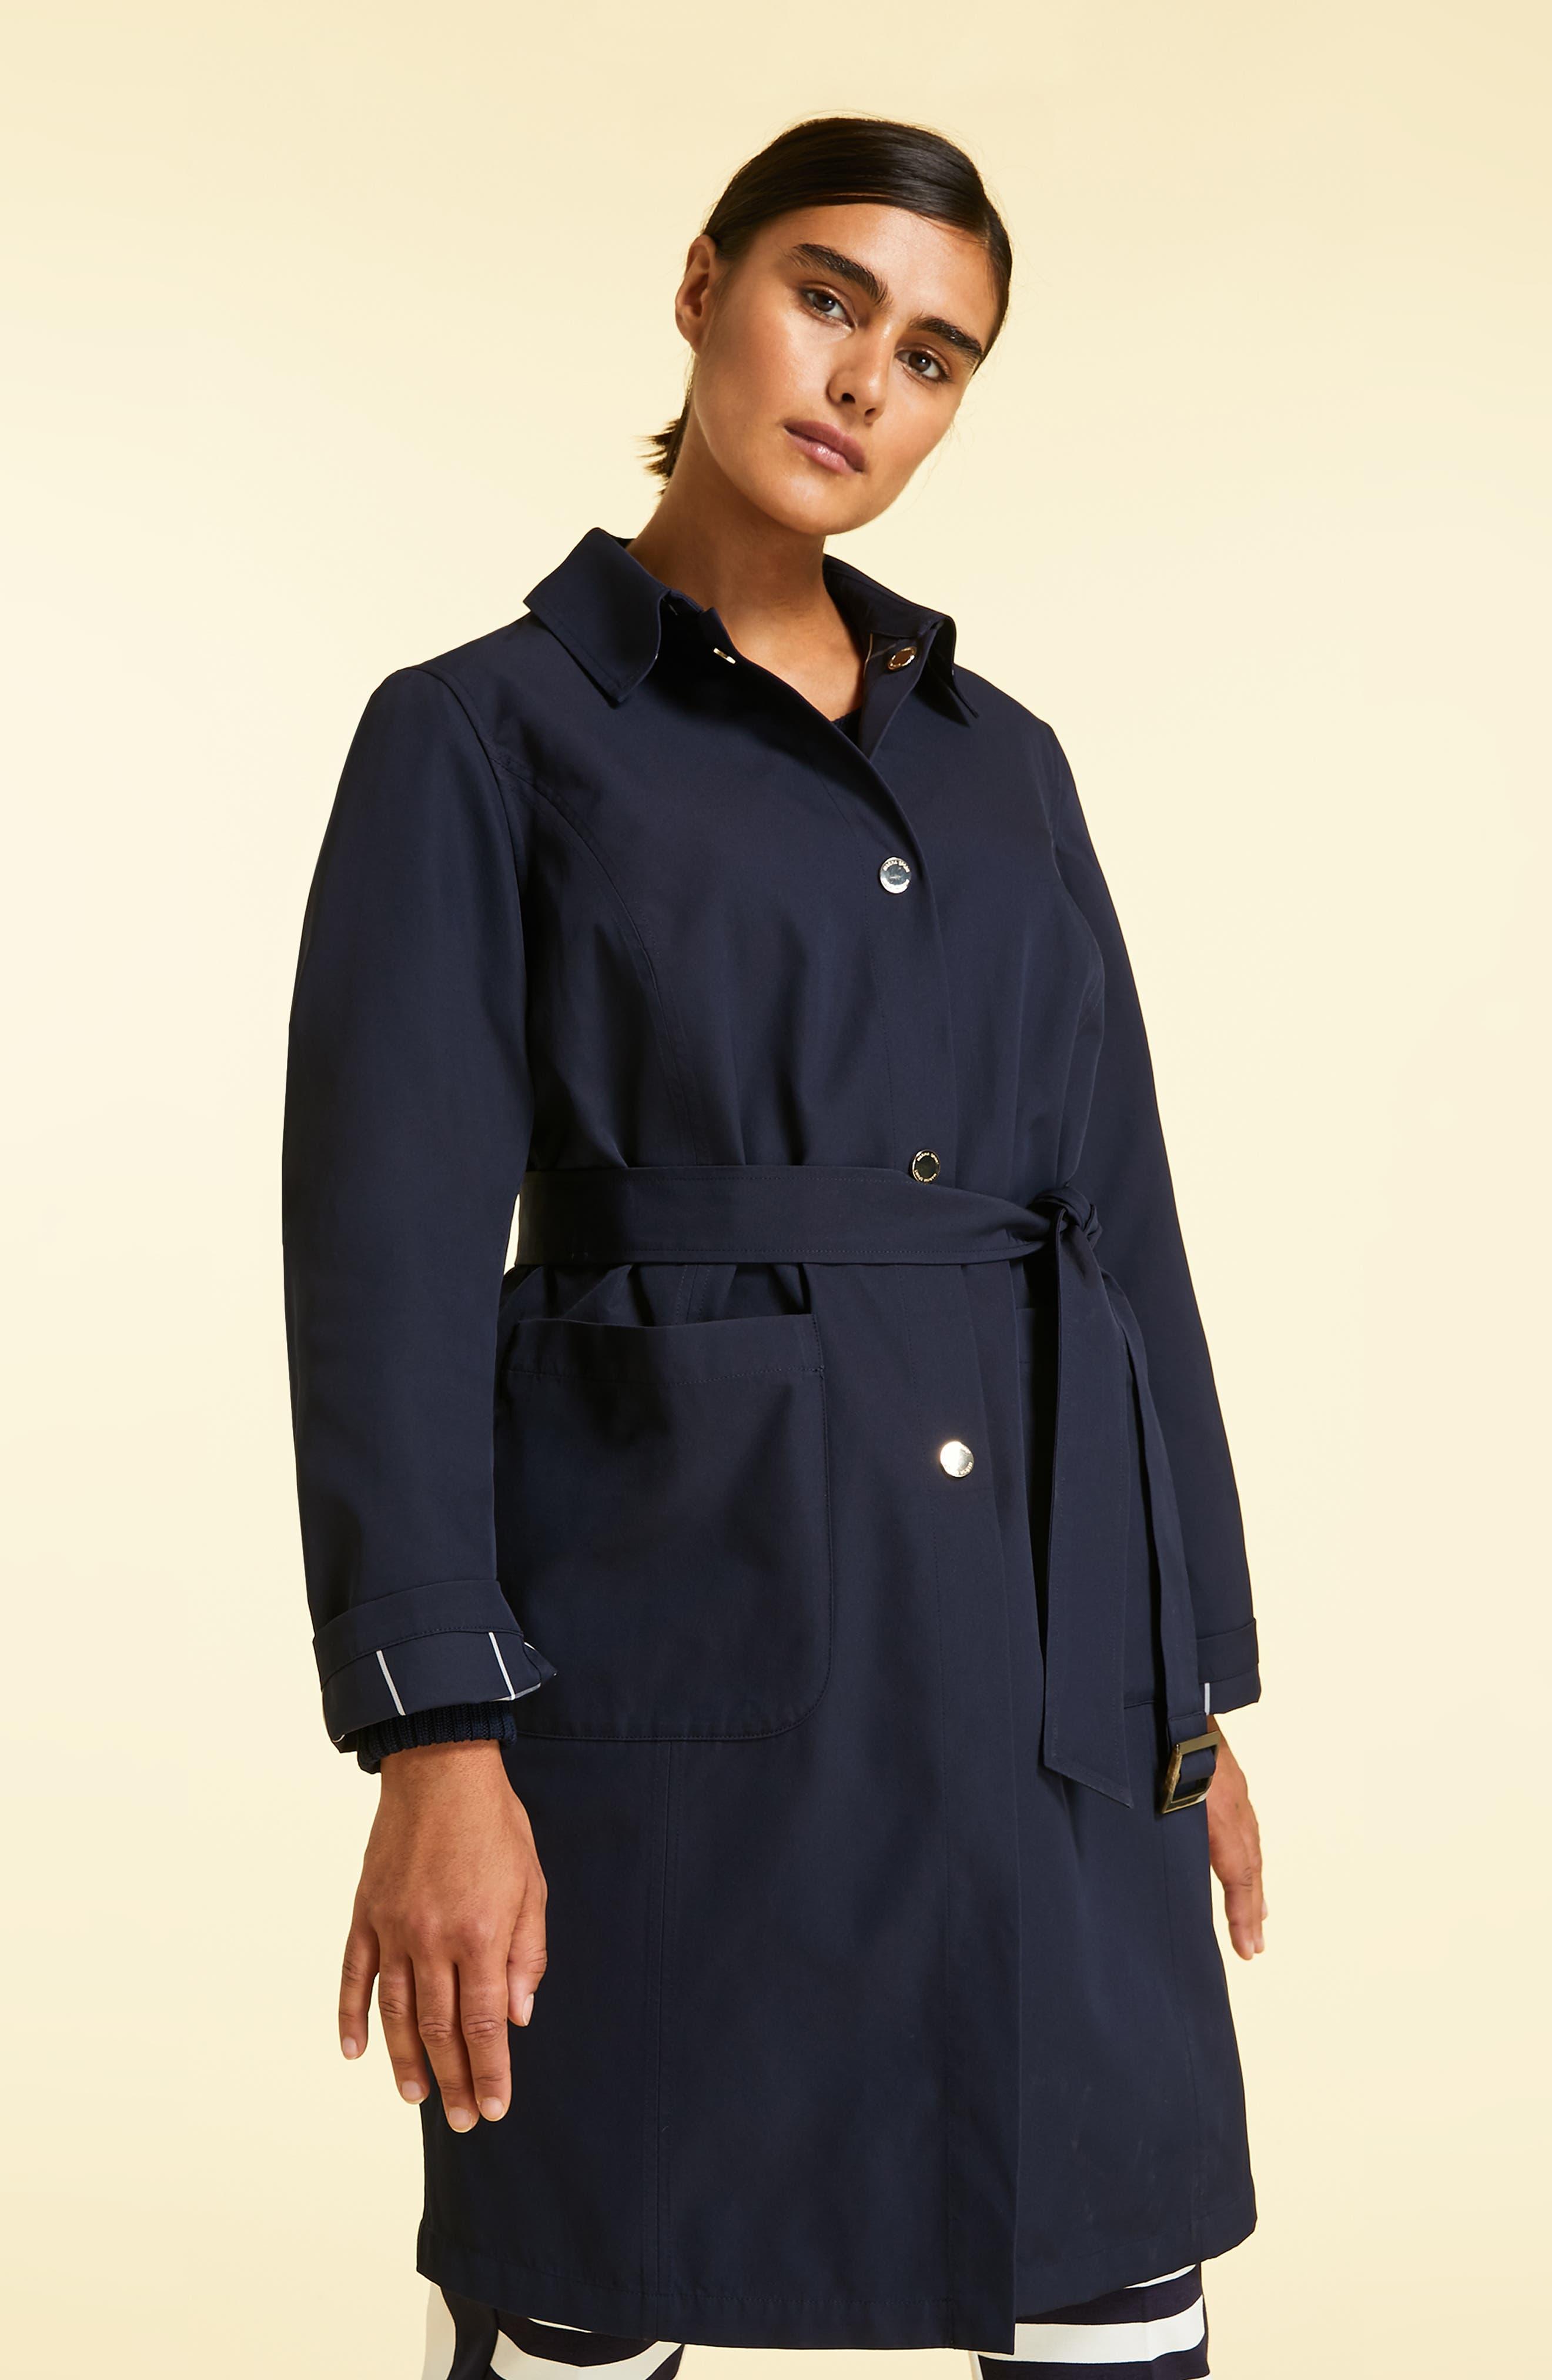 Tabella Reversible Raincoat,                             Alternate thumbnail 8, color,                             NAVY BLUE